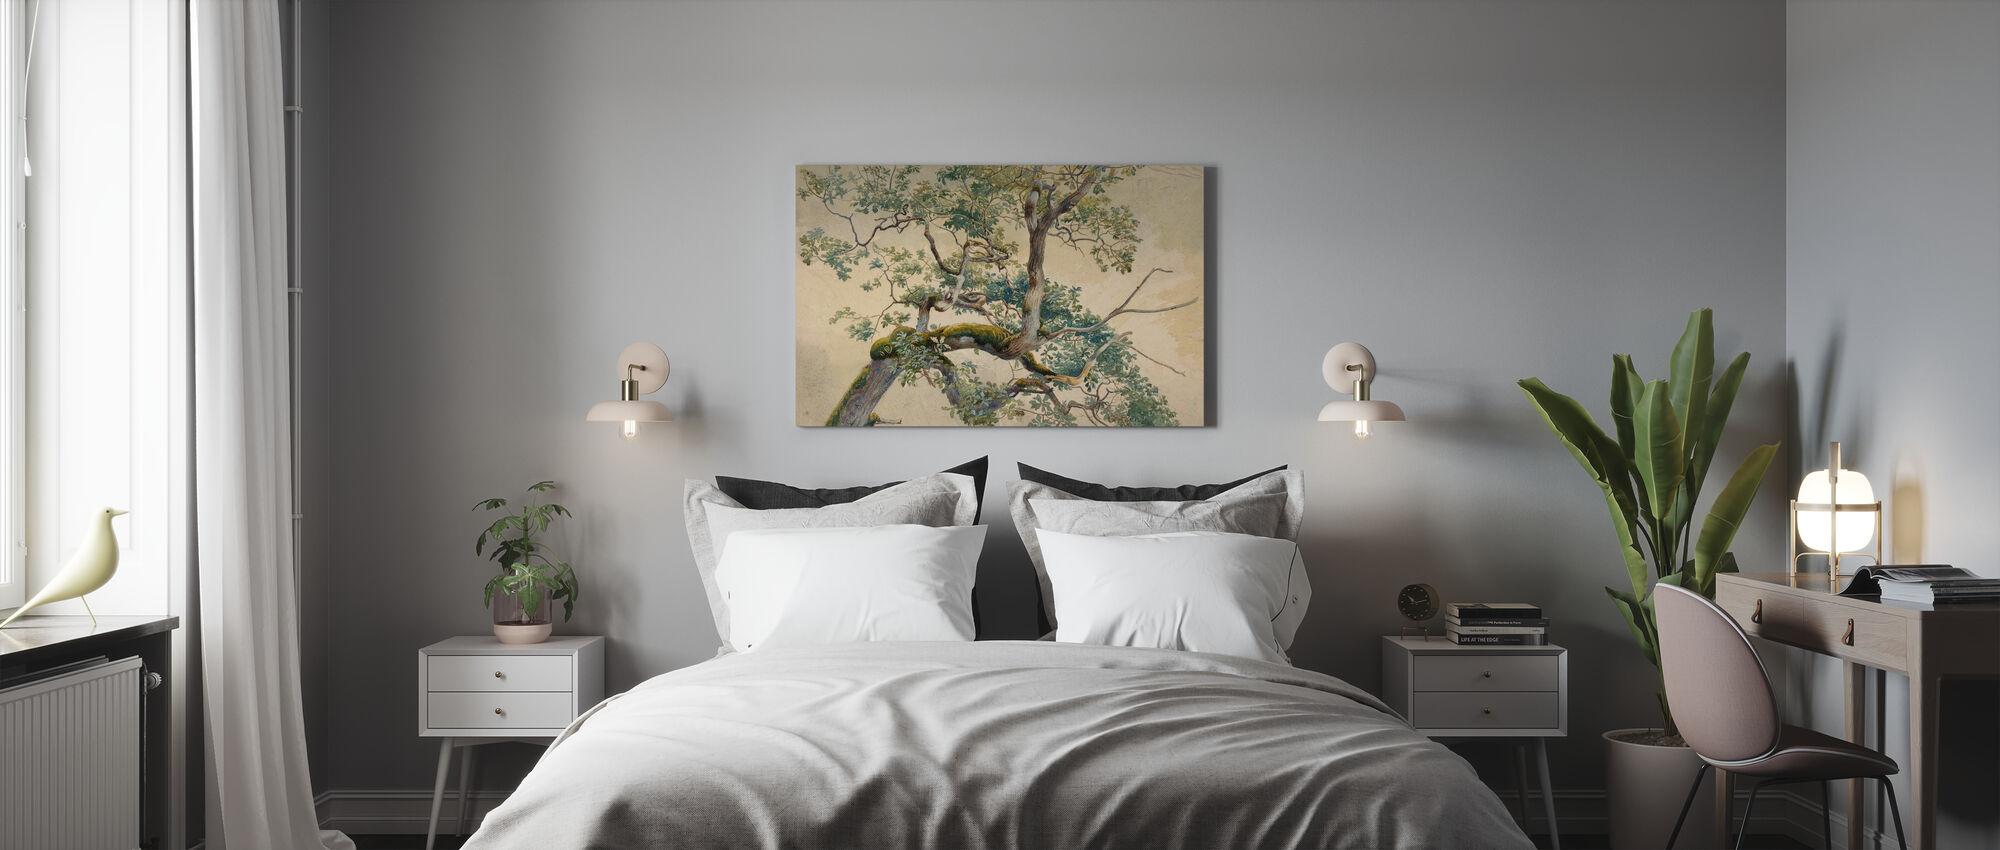 Tree Branch Art - Charles Reginald Aston - Canvas print - Bedroom